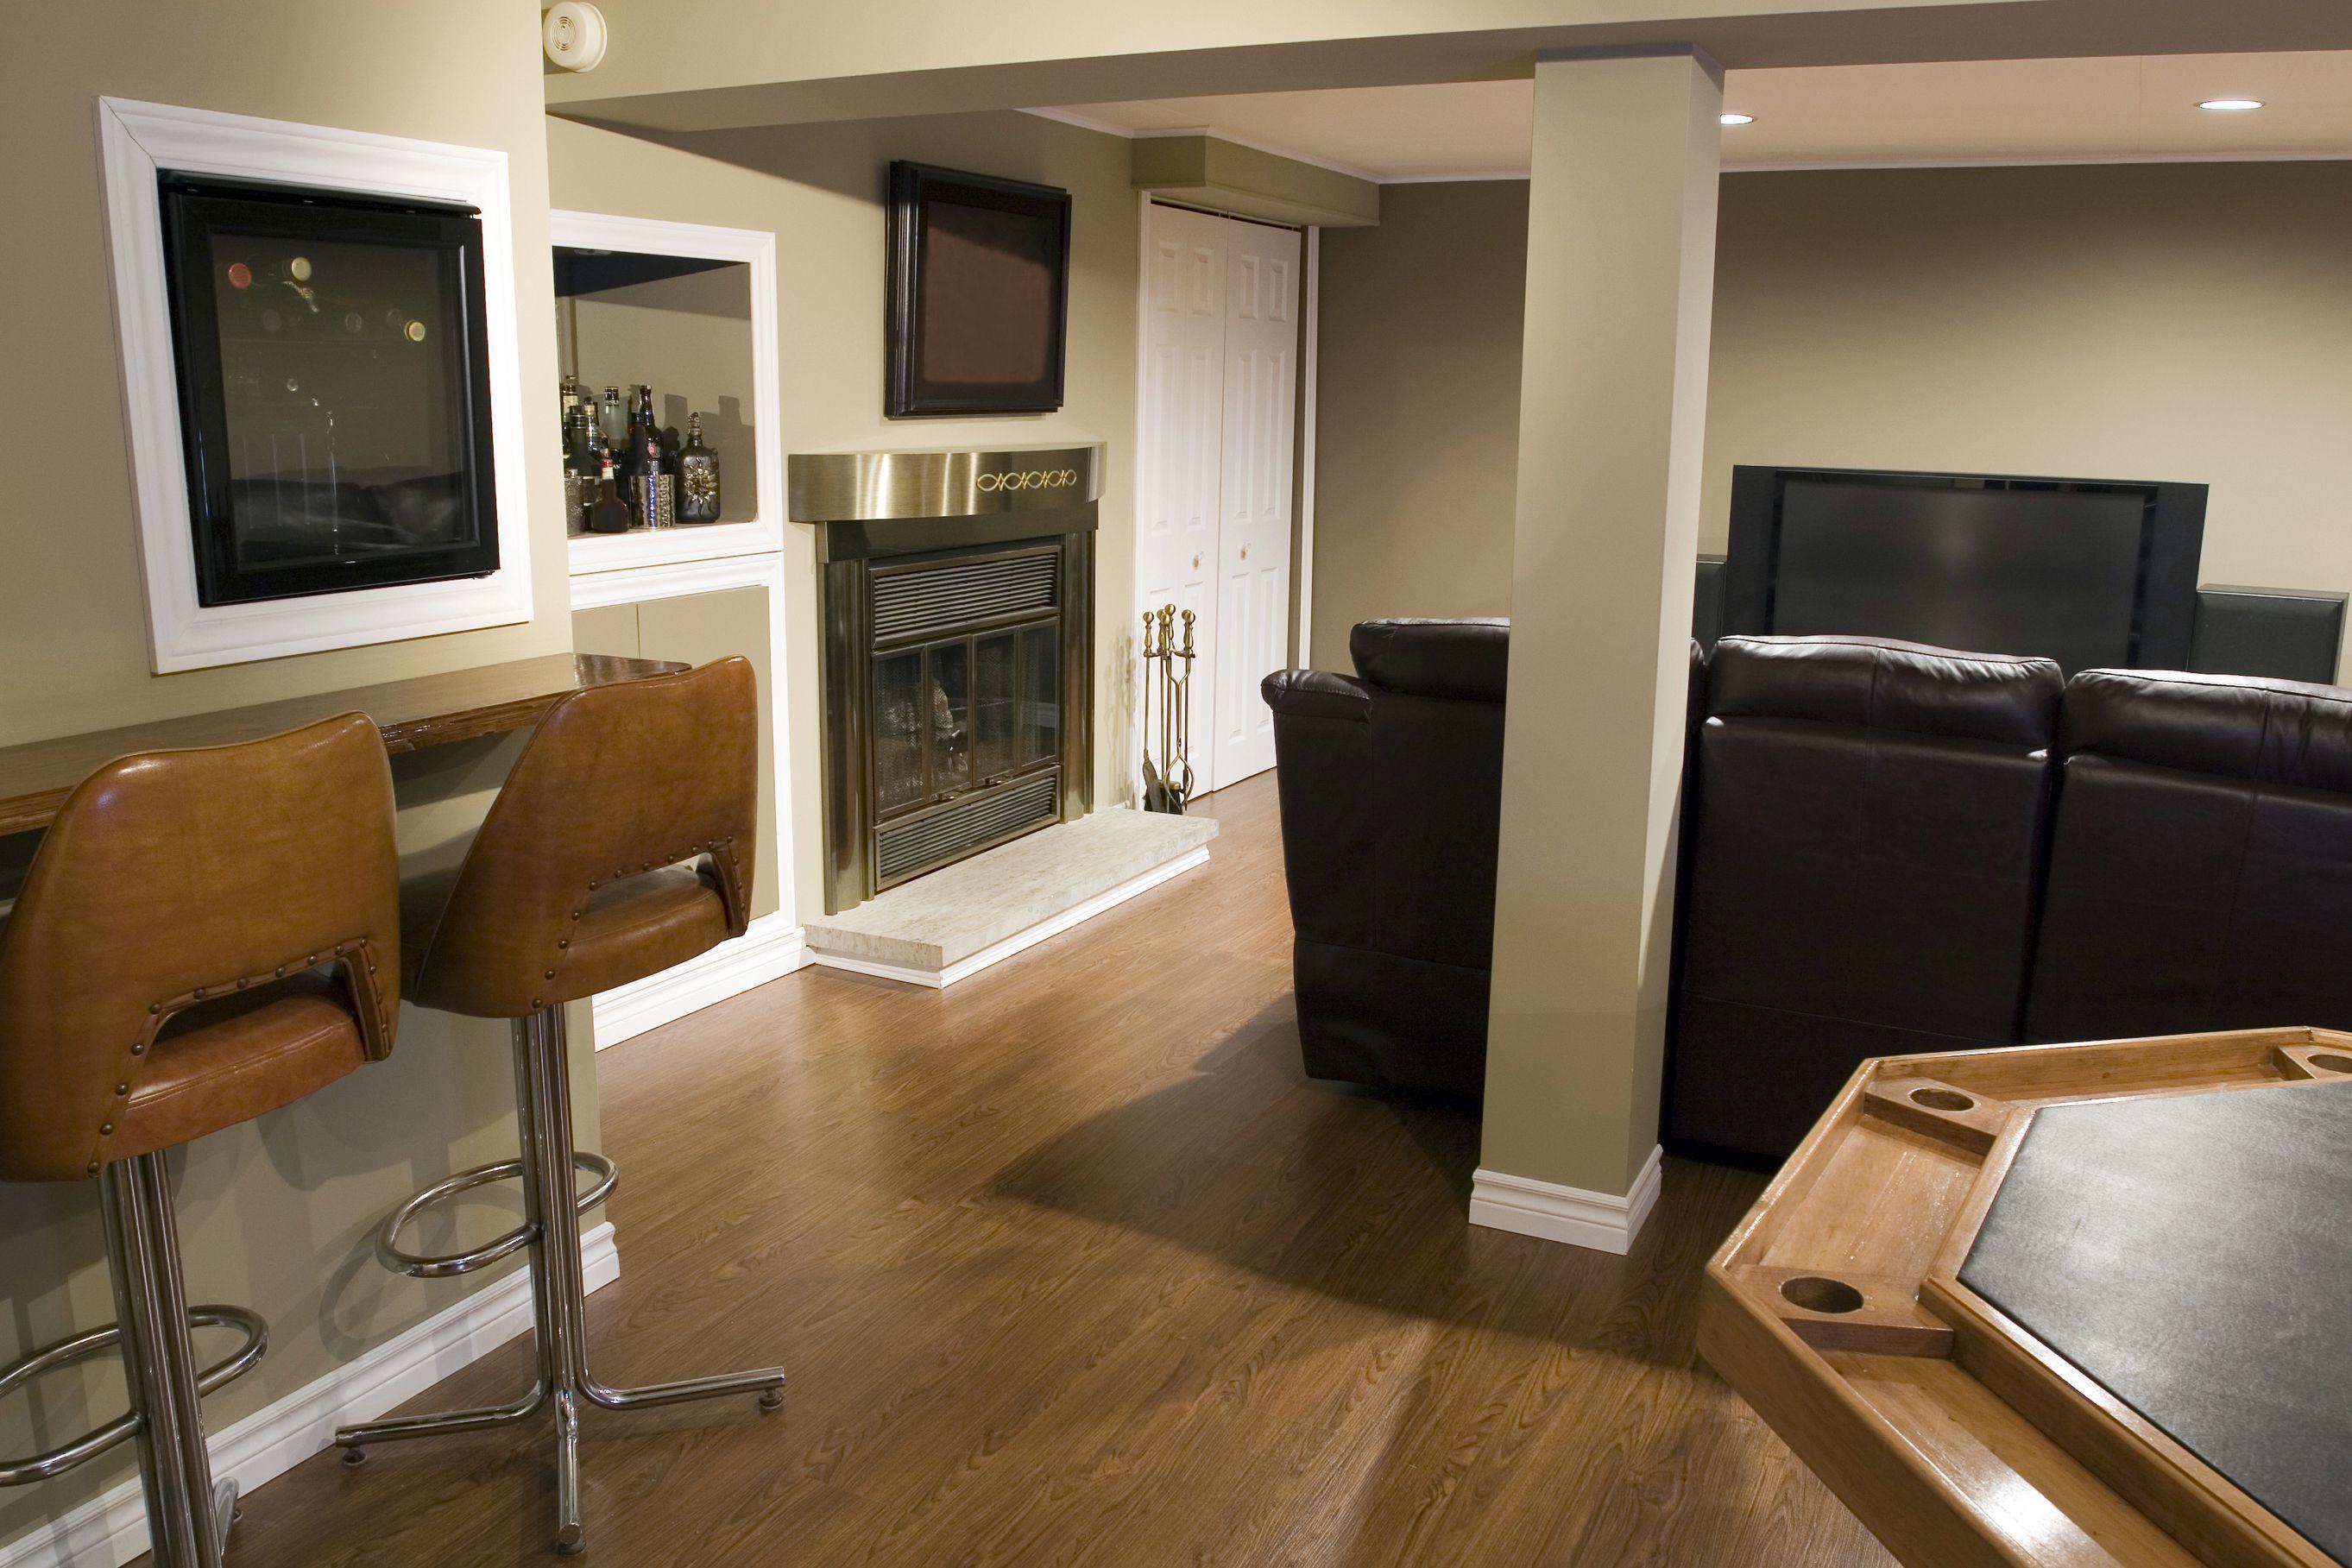 hardwood floor transition from room to room of best basement flooring options within basementflooring 5bb76ea04cedfd00261522e8